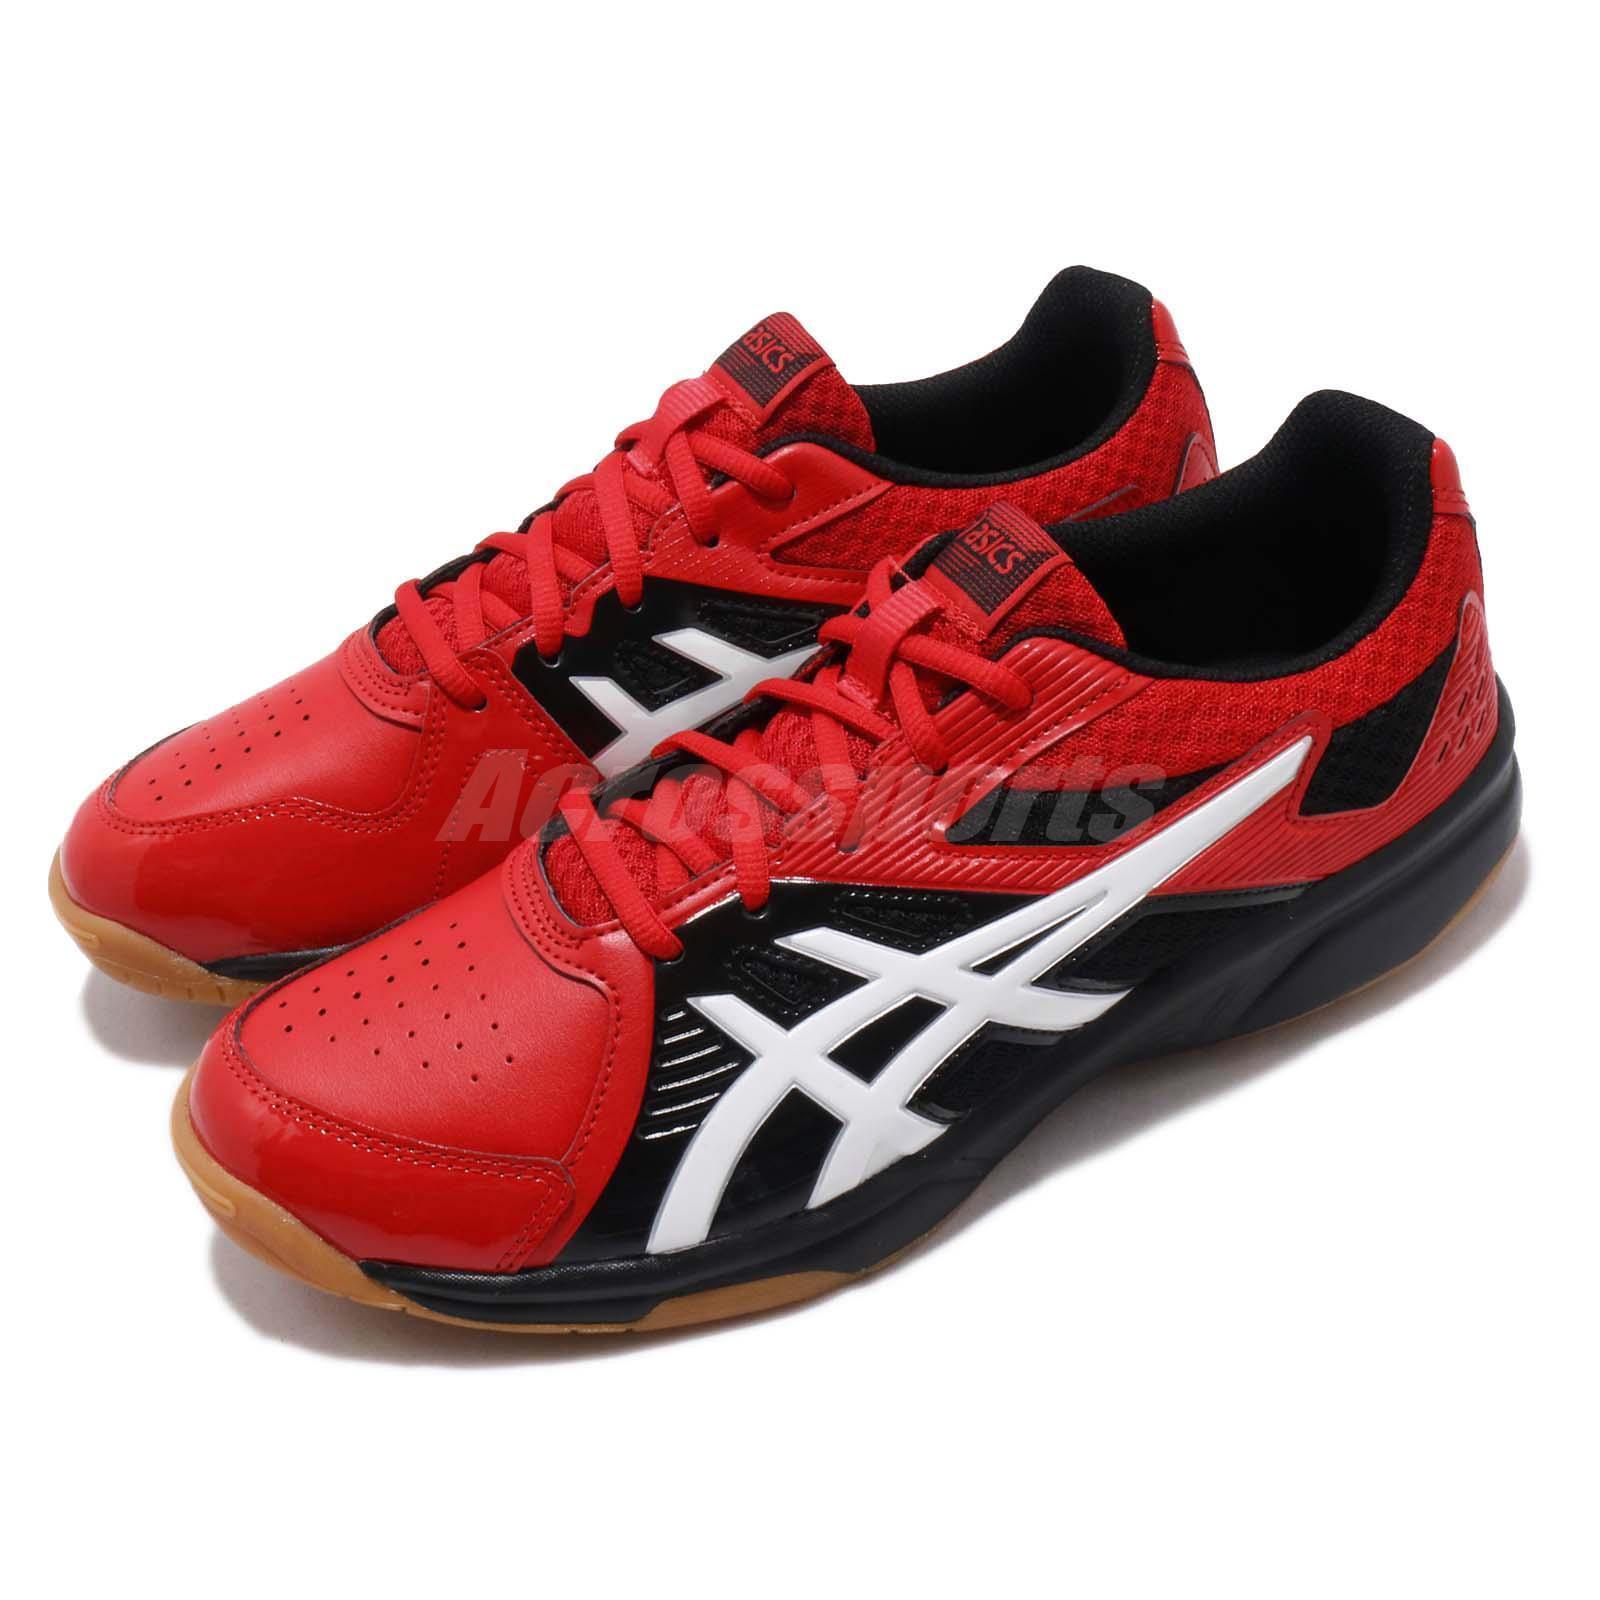 Asics Court Break Red White Black Gum Men Volleyball Badminton shoes 1071A003-608